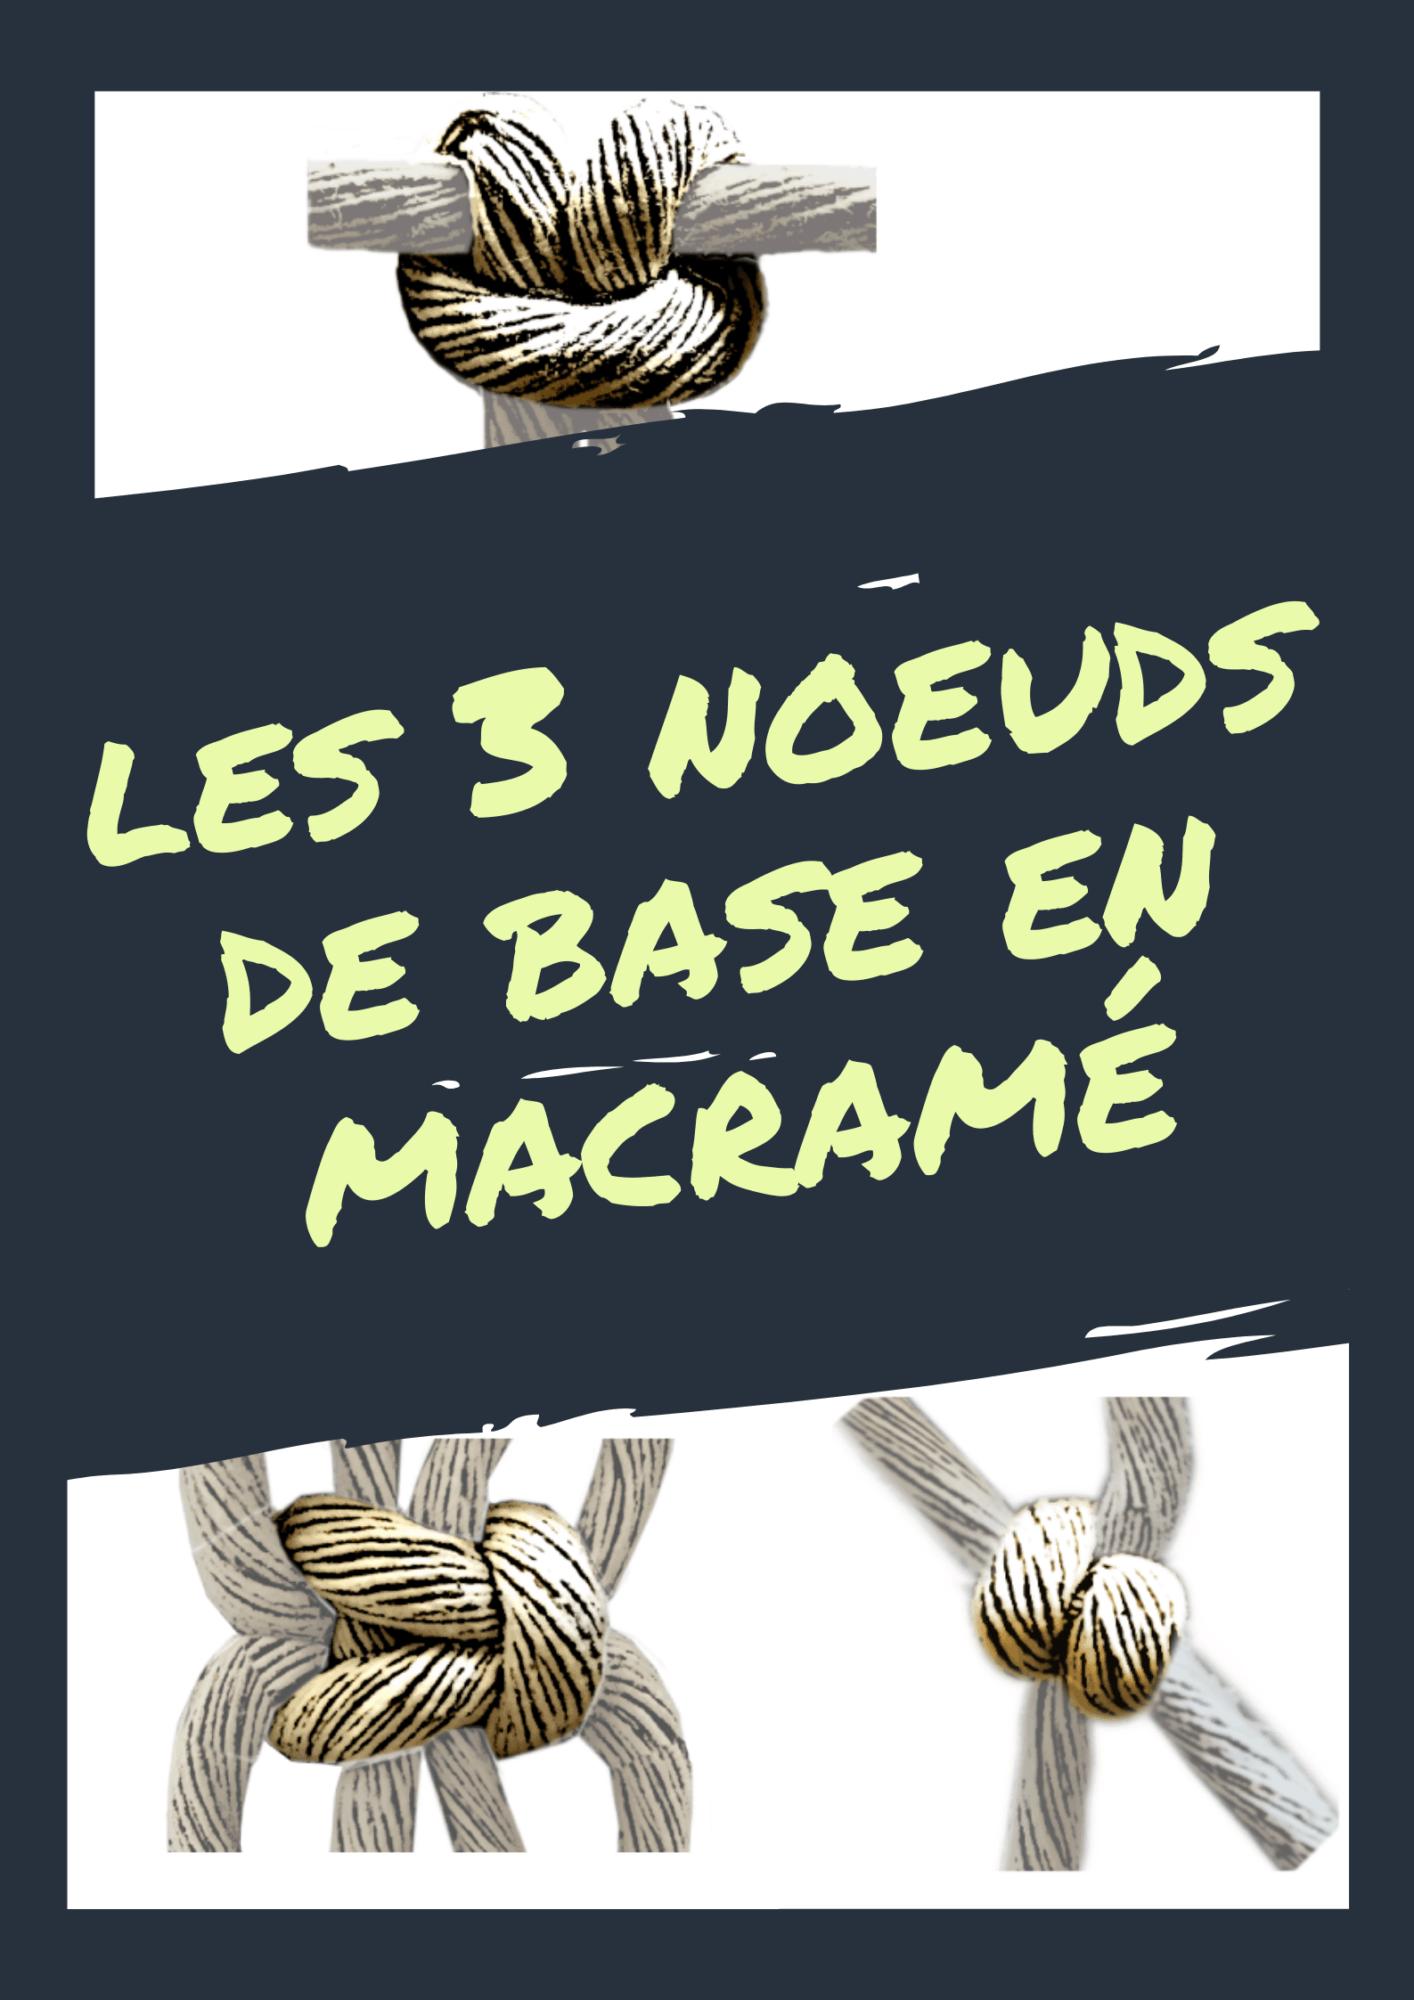 Quels sont les noeuds de base en macramé ?